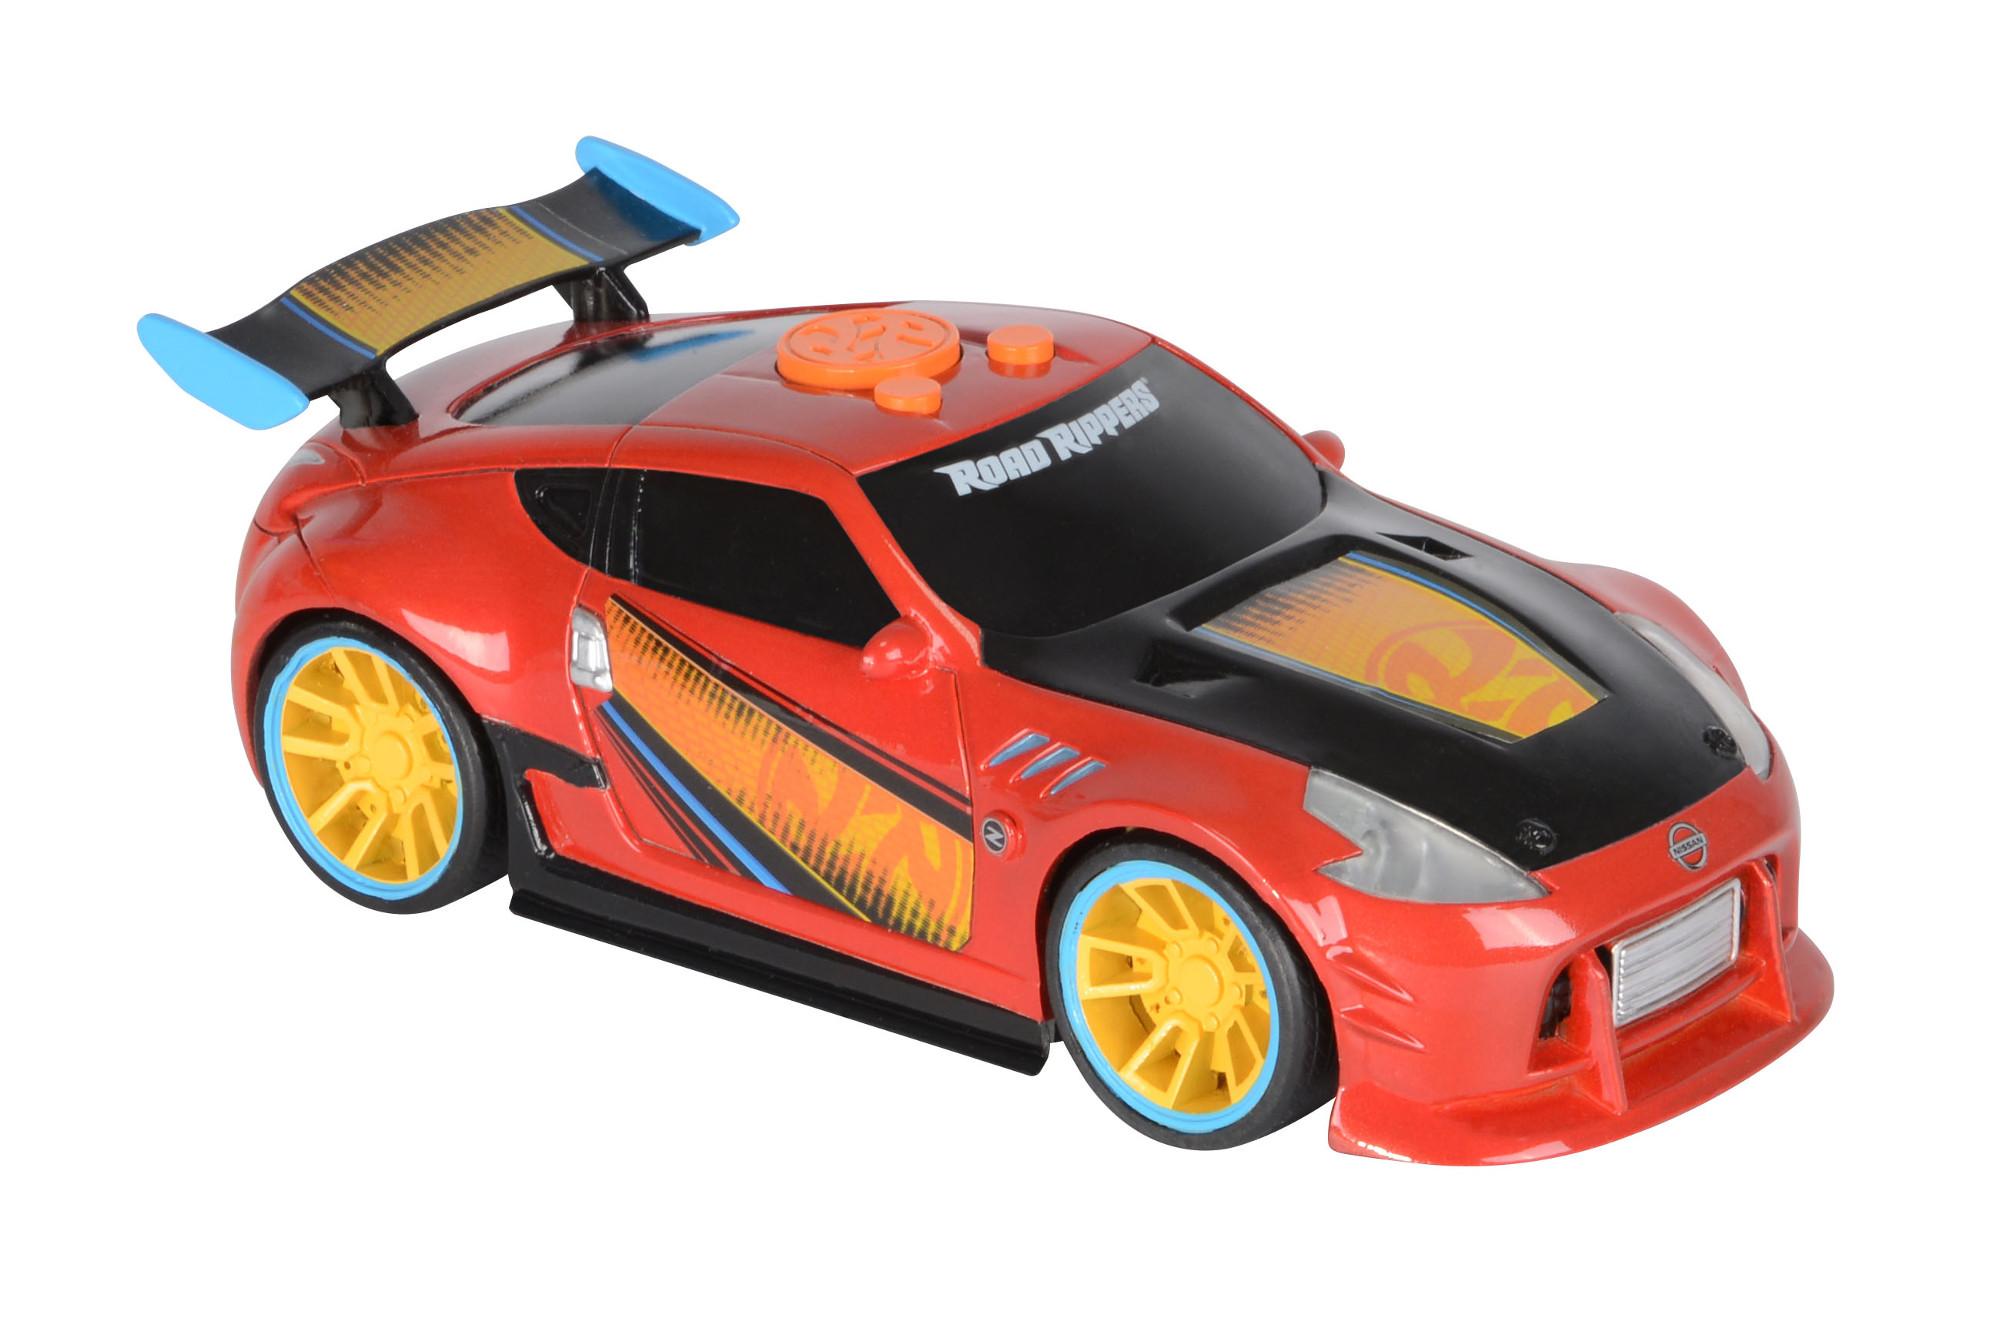 Road Rippers Skidders Motorized Vehicle - Nissan 370Z PartNumber: 004W061349411022P KsnValue: 004W061349411022 MfgPartNumber: 33506/33508